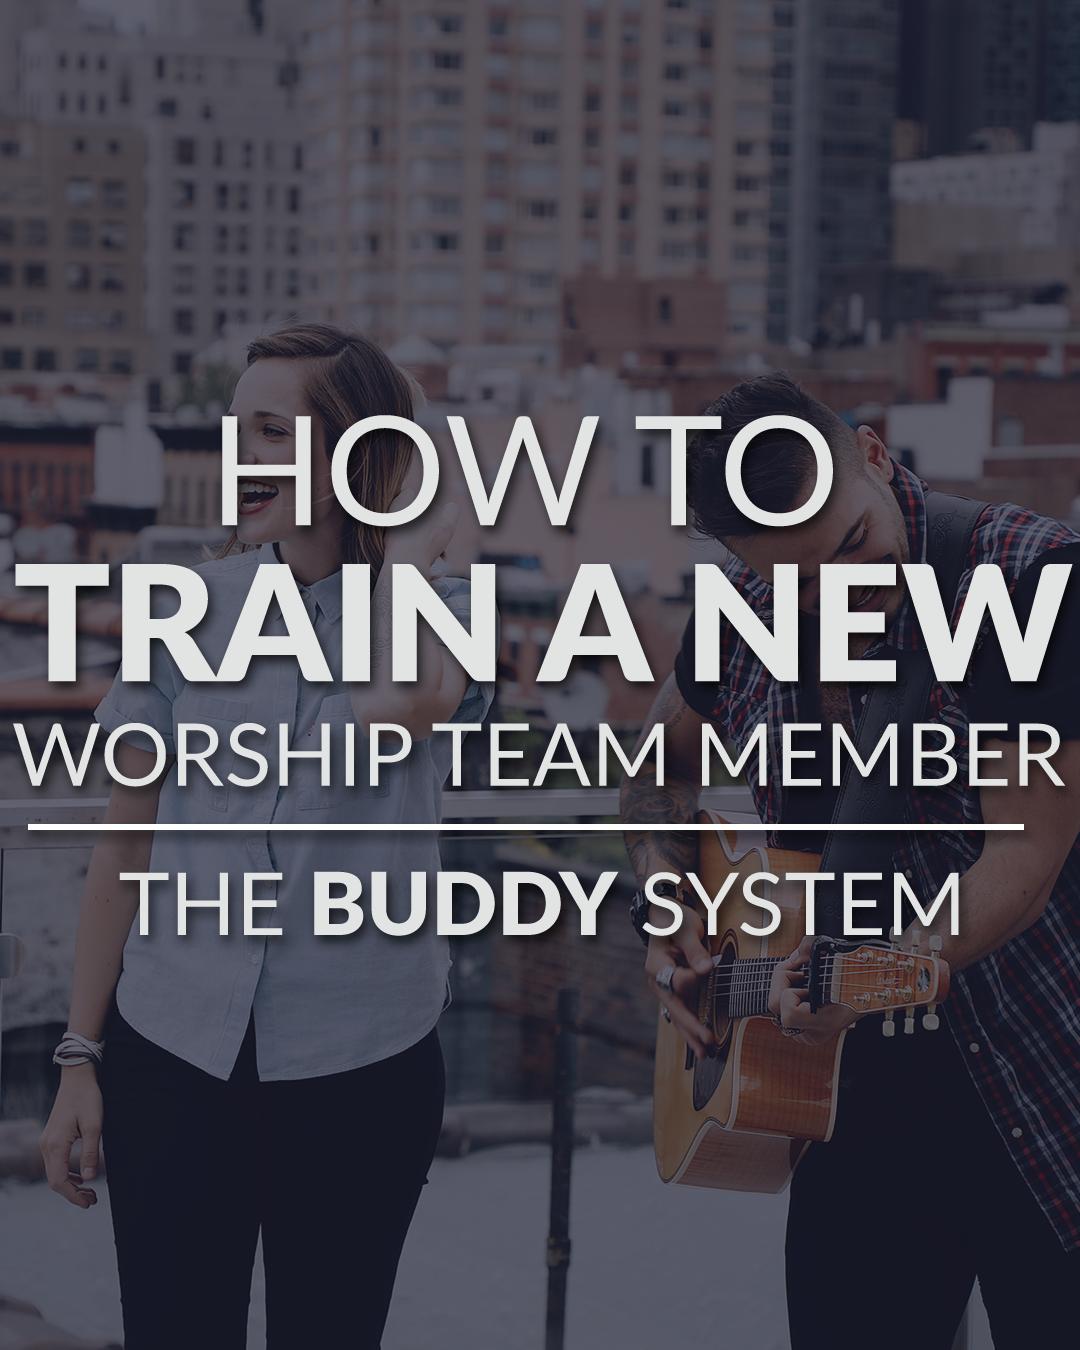 Train worship team members - the buddy system